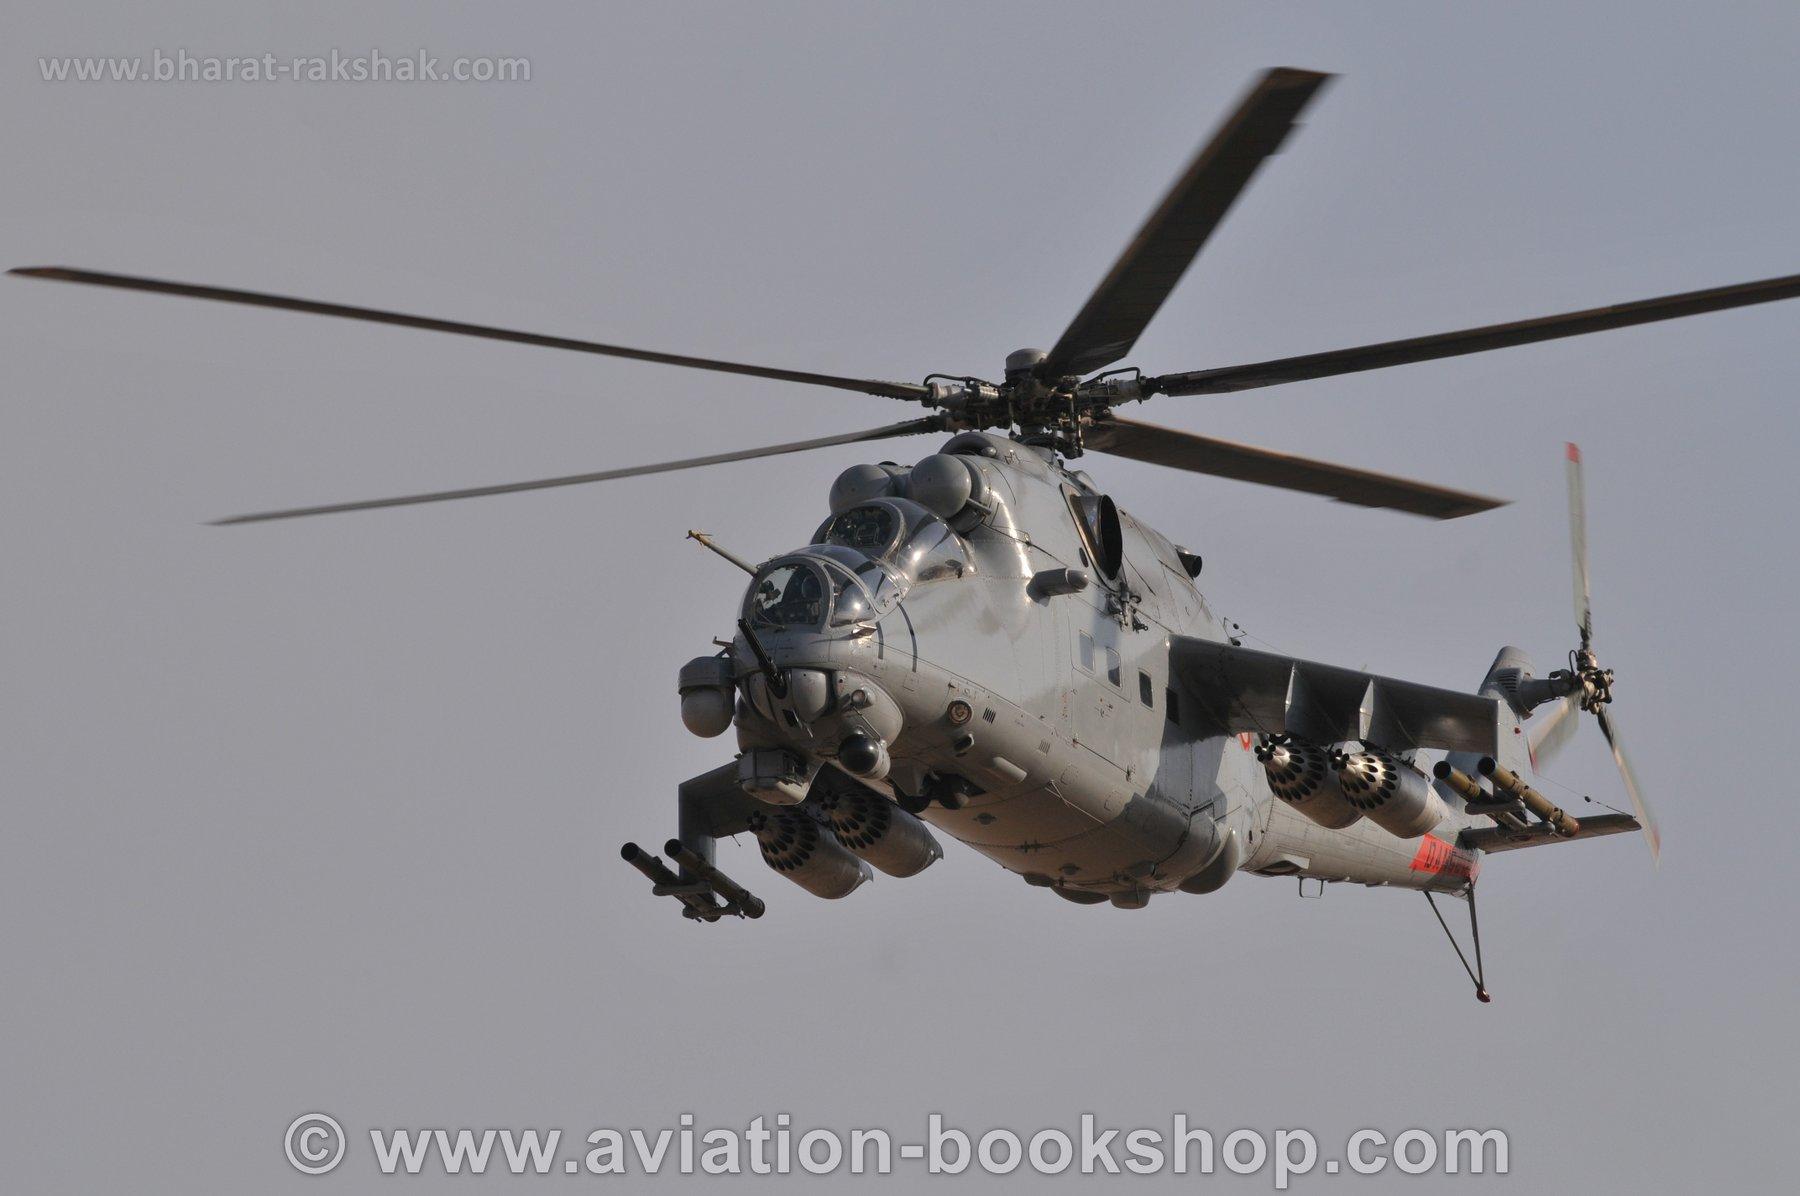 http://www.bharat-rakshak.com/IAF/Galleries/30295-1/Mi35_01.jpg